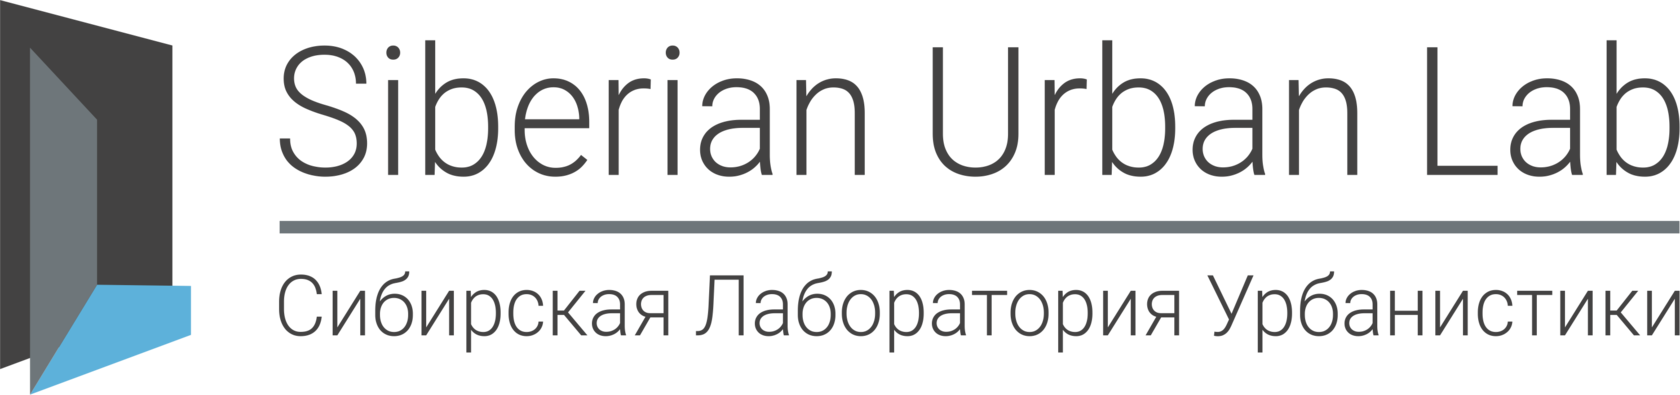 Siberian Urban Lab